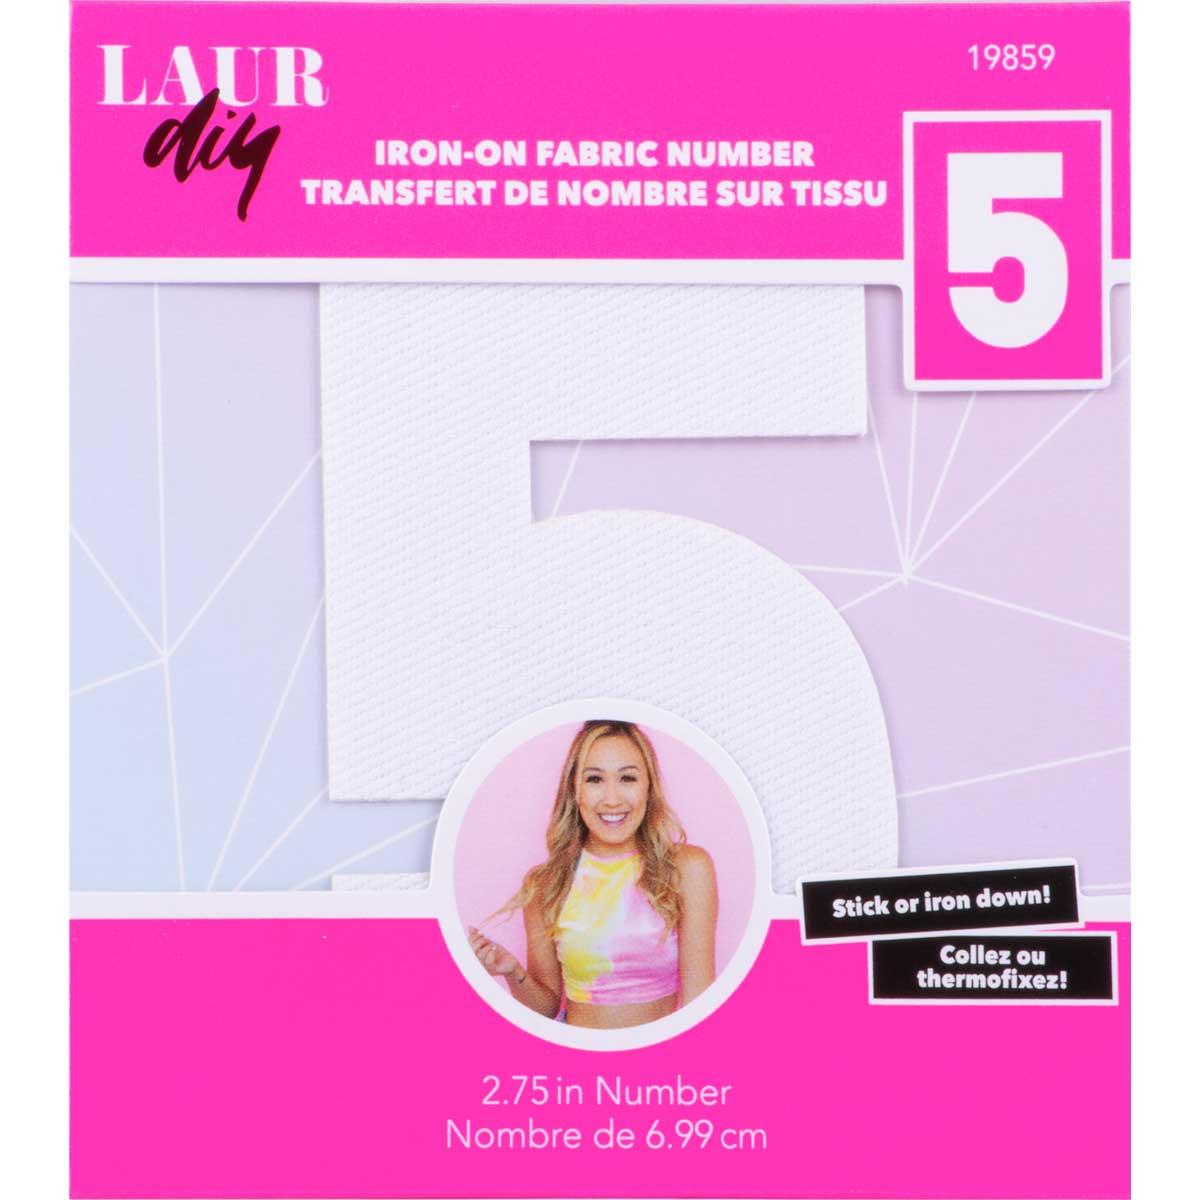 LaurDIY ® Iron-on Fabric Letters - 5 - 19859